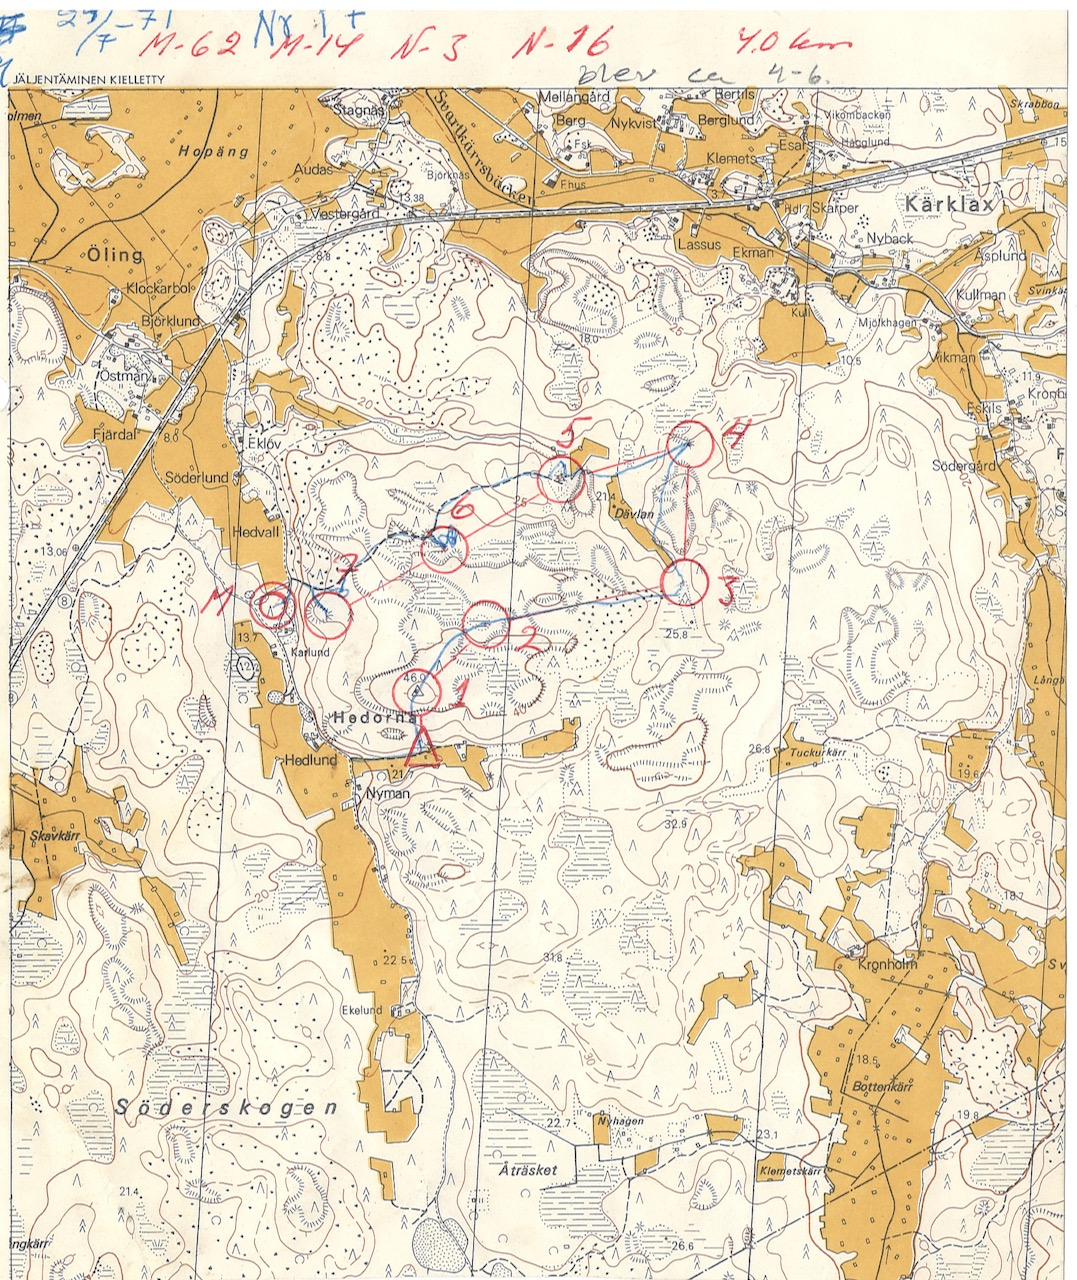 24.7.1971, Kärklax